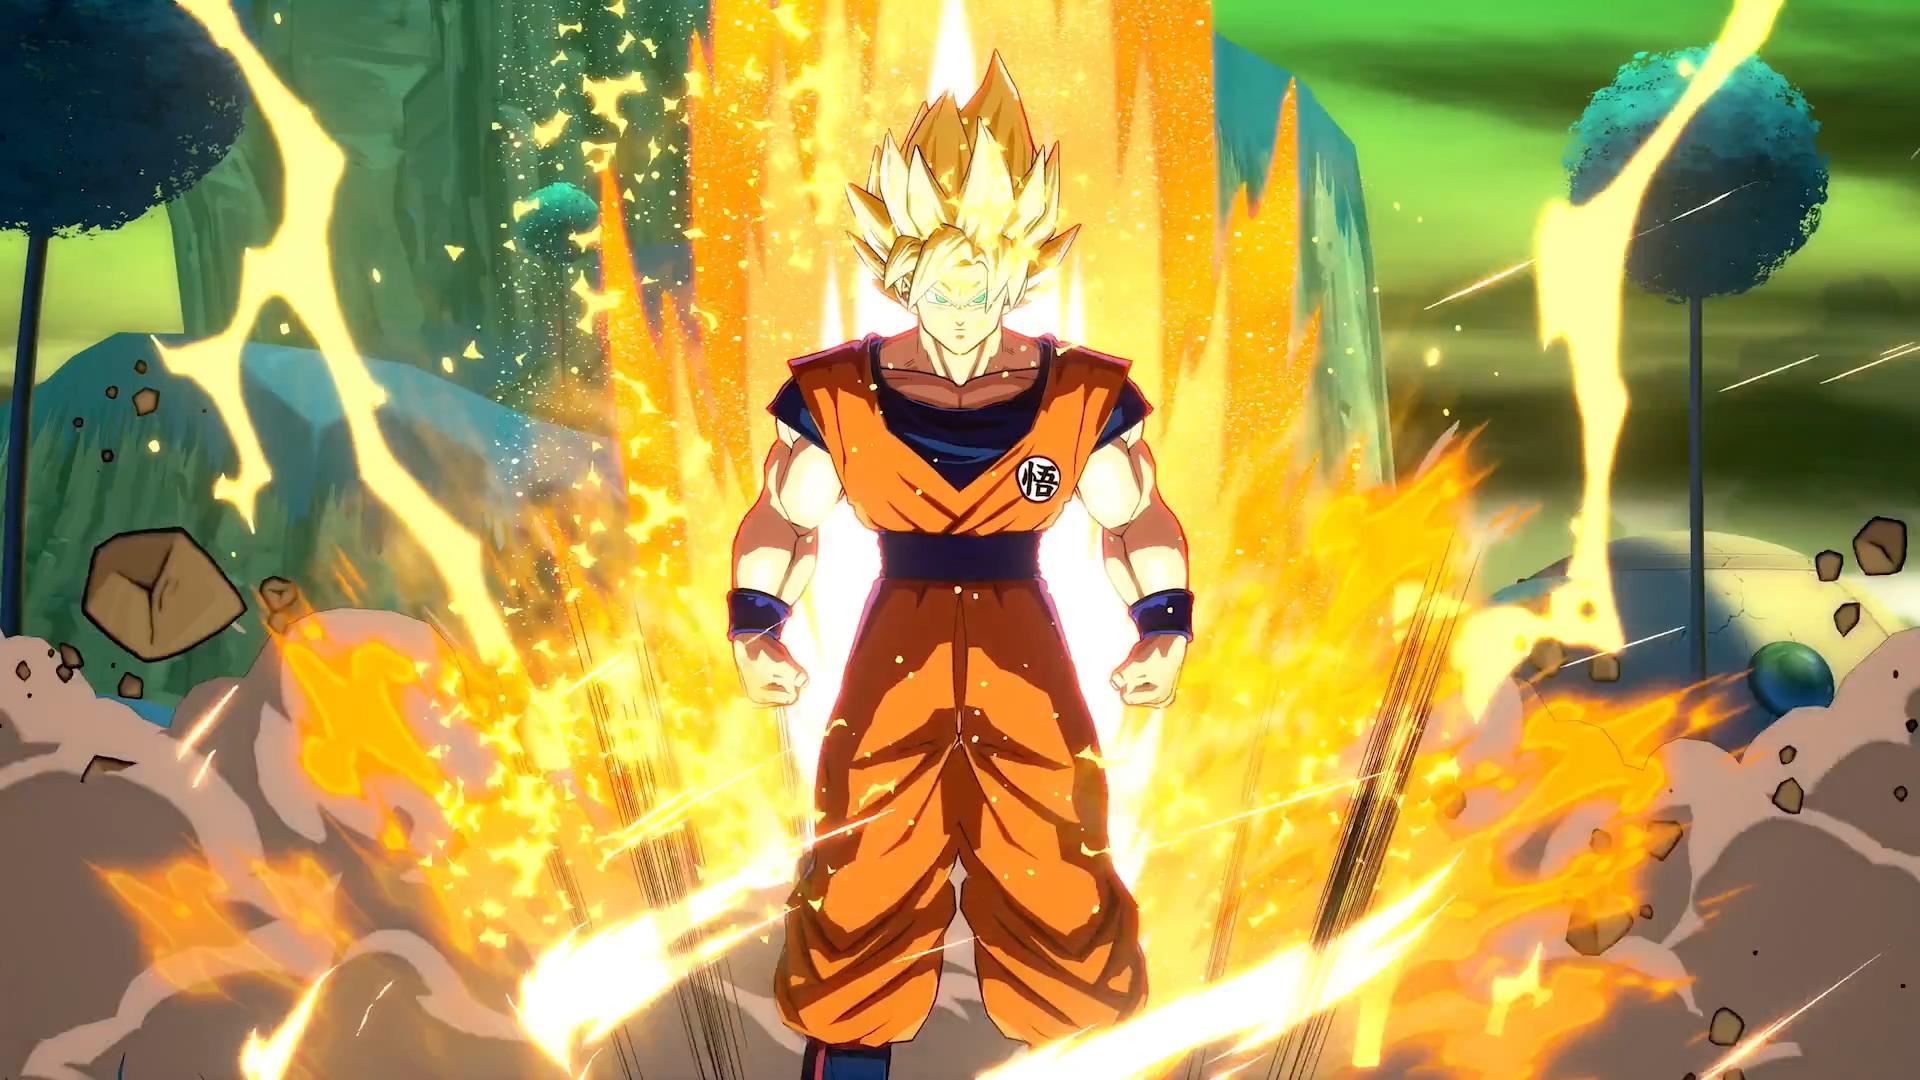 Goku Dragon Ball Z Fighter 1374339 Hd Wallpaper Backgrounds